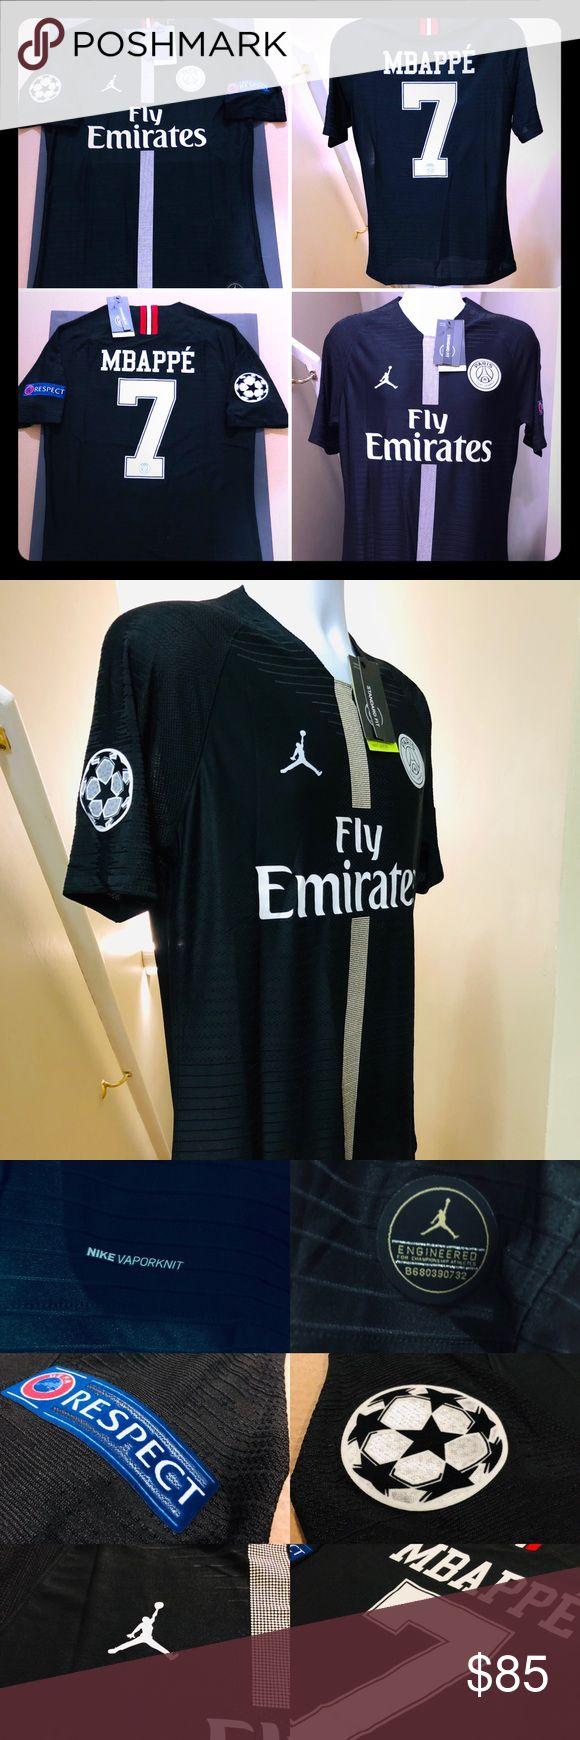 marca de camiseta del psg